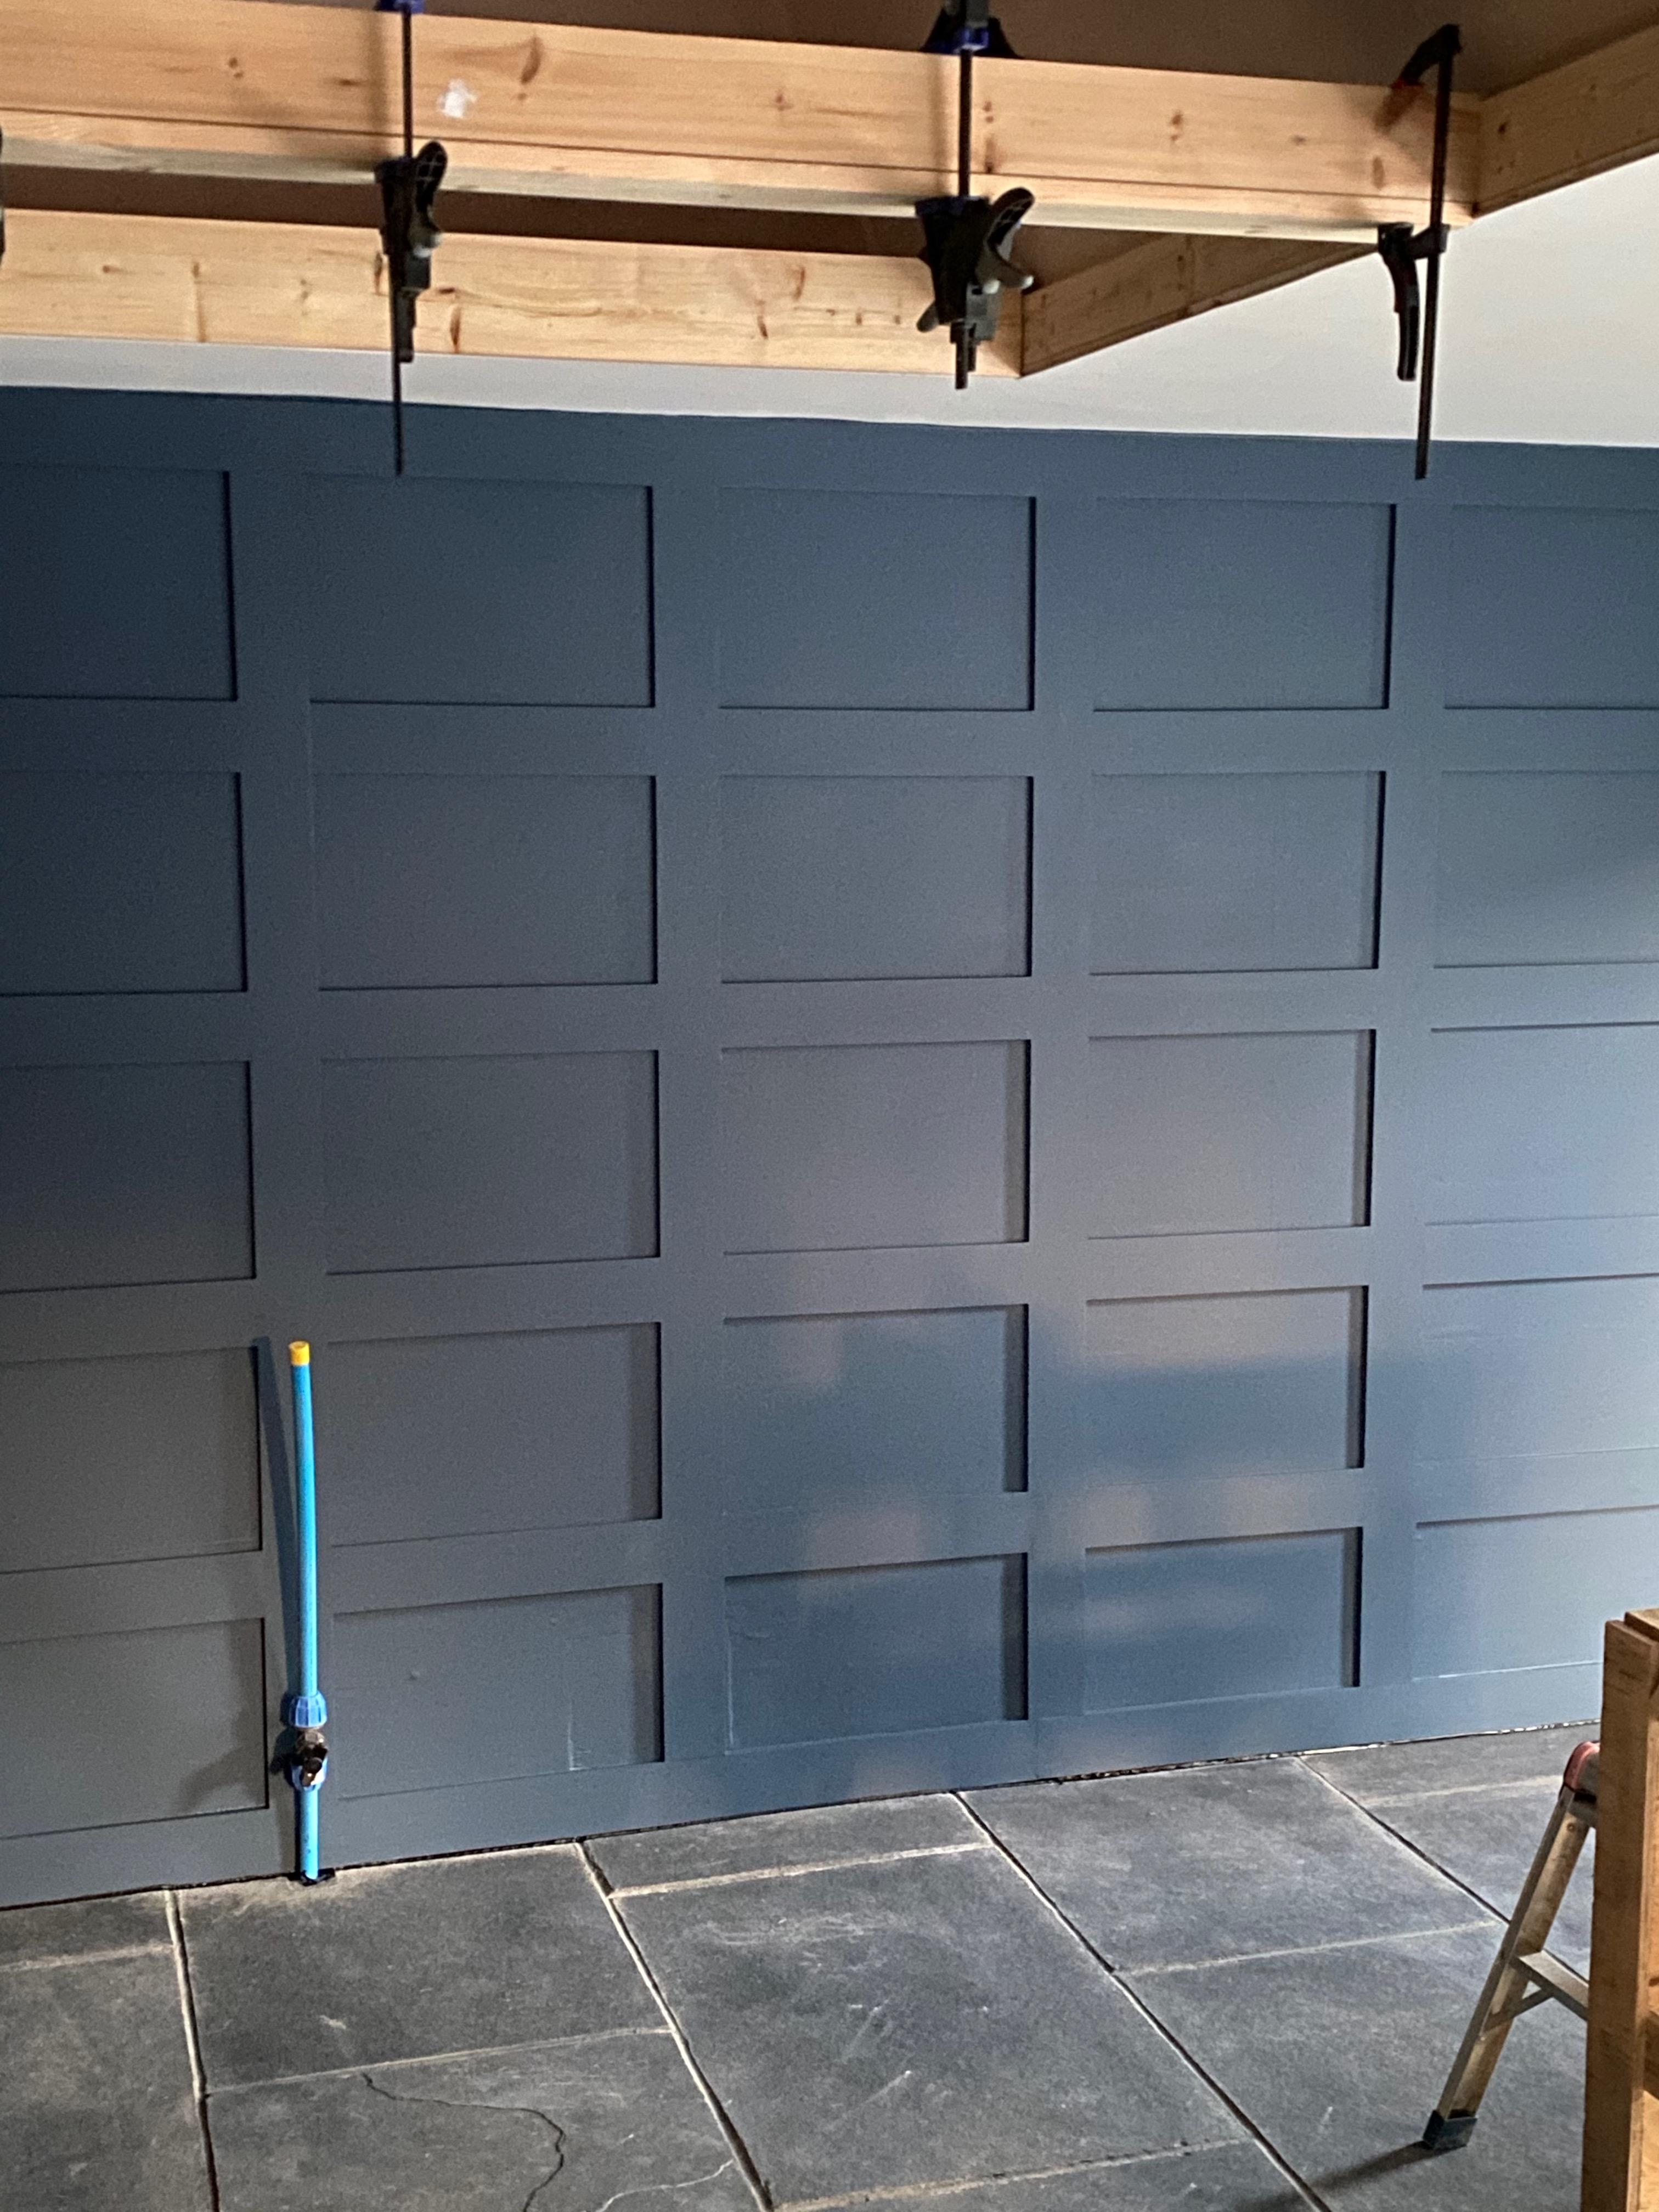 panelled walls.jpeg